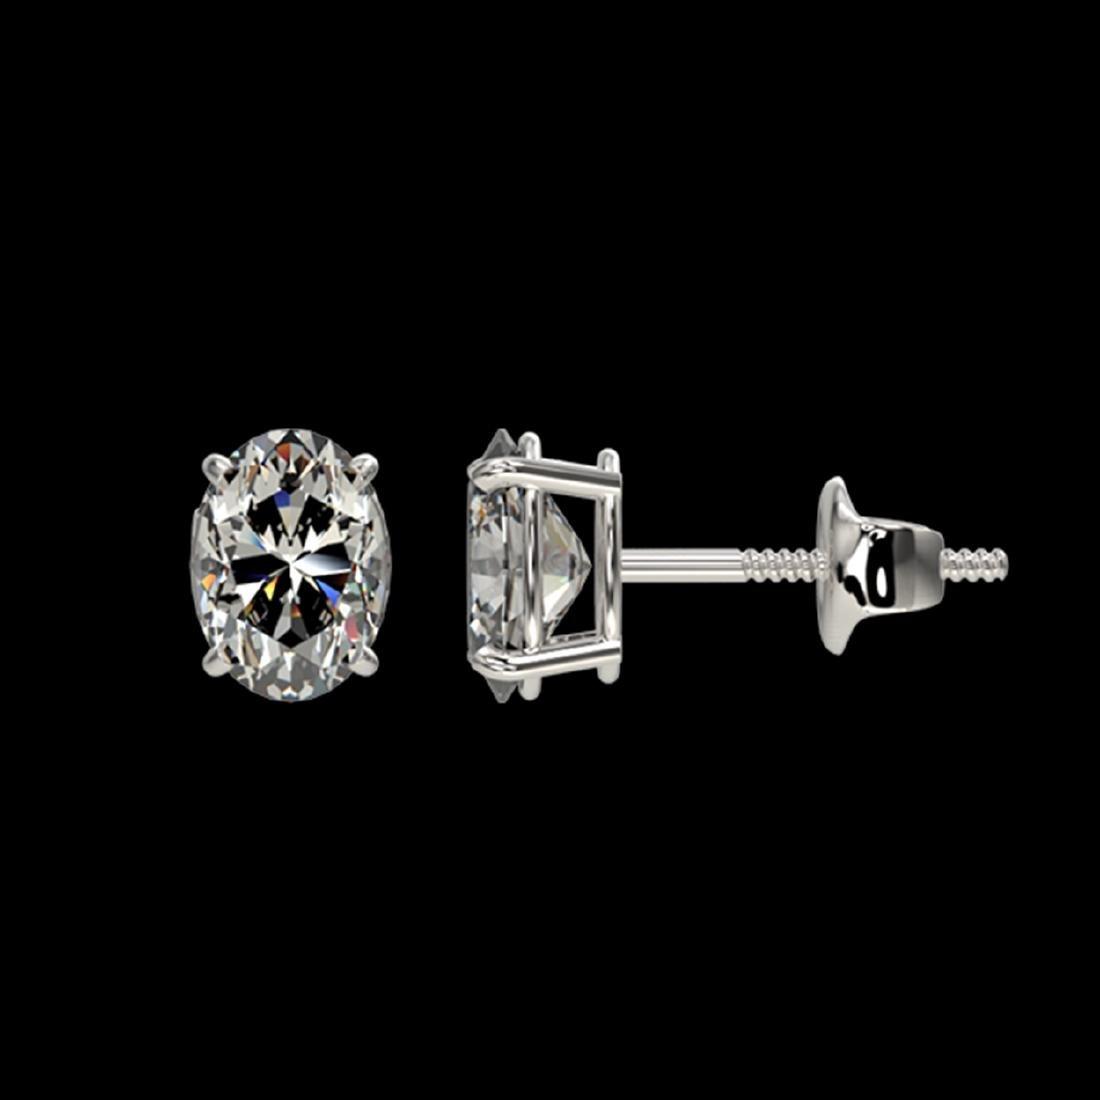 1 CTW VS/SI Quality Oval Diamond Stud Earrings Gold - - 2